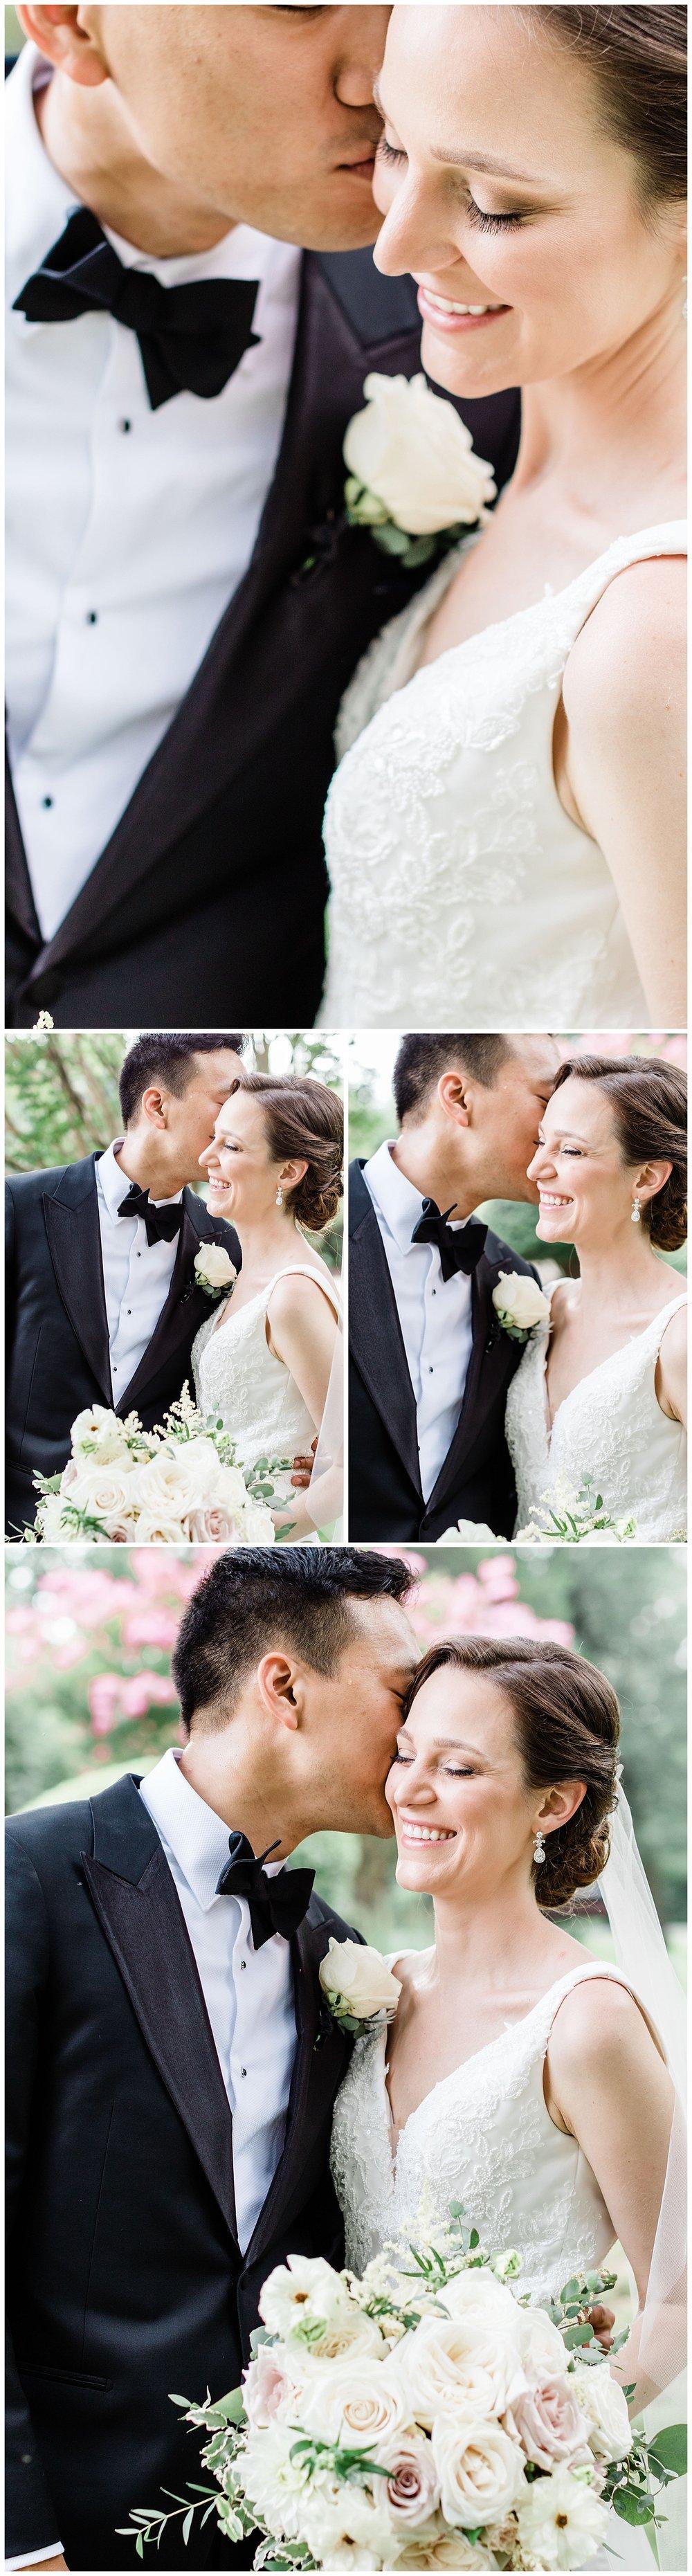 Elizabeth M Photography Charlottesville Wedding Photography_0471.jpg